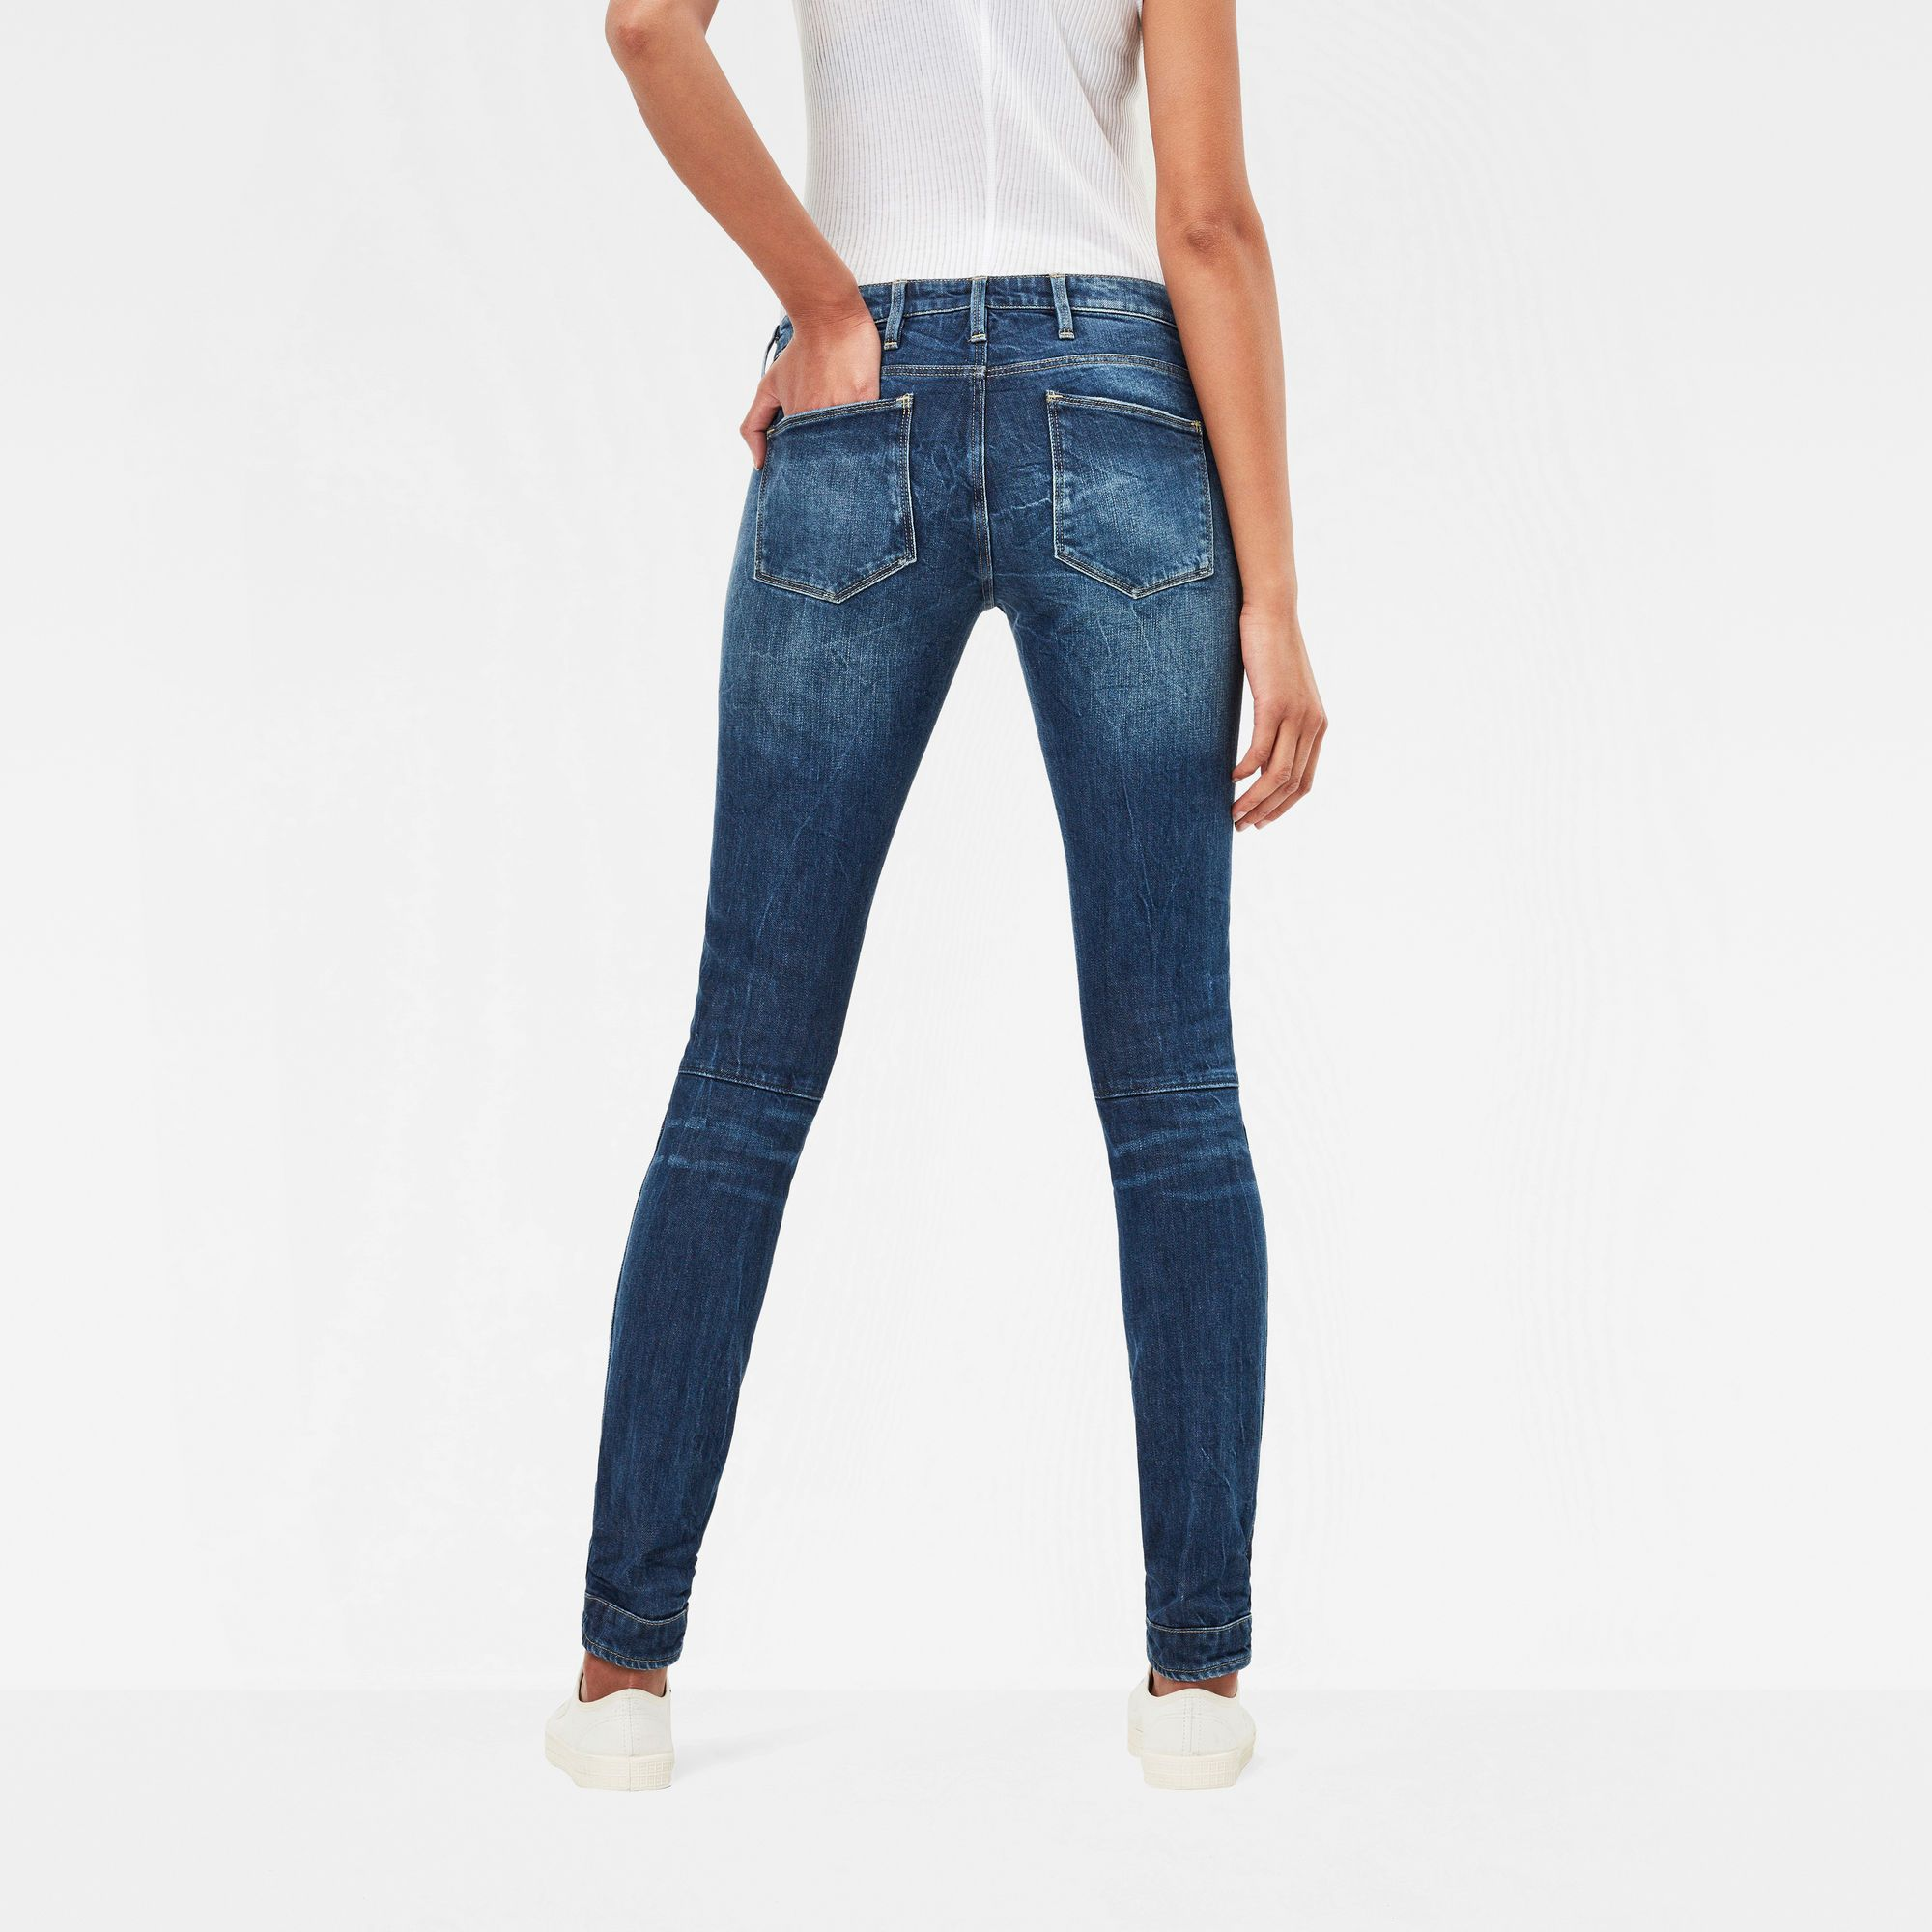 G-Star RAW 5620 G-Star Elwood Mid Waist Skinny Jeans